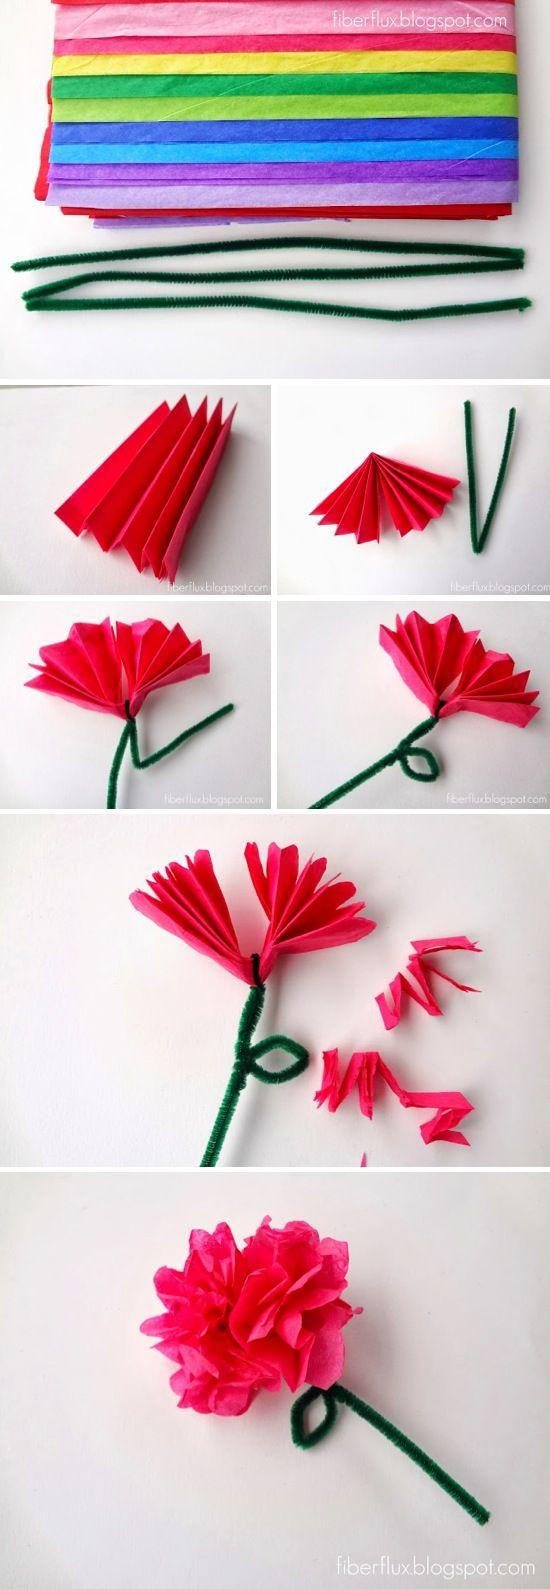 best flower making images on Pinterest  Cloth flowers